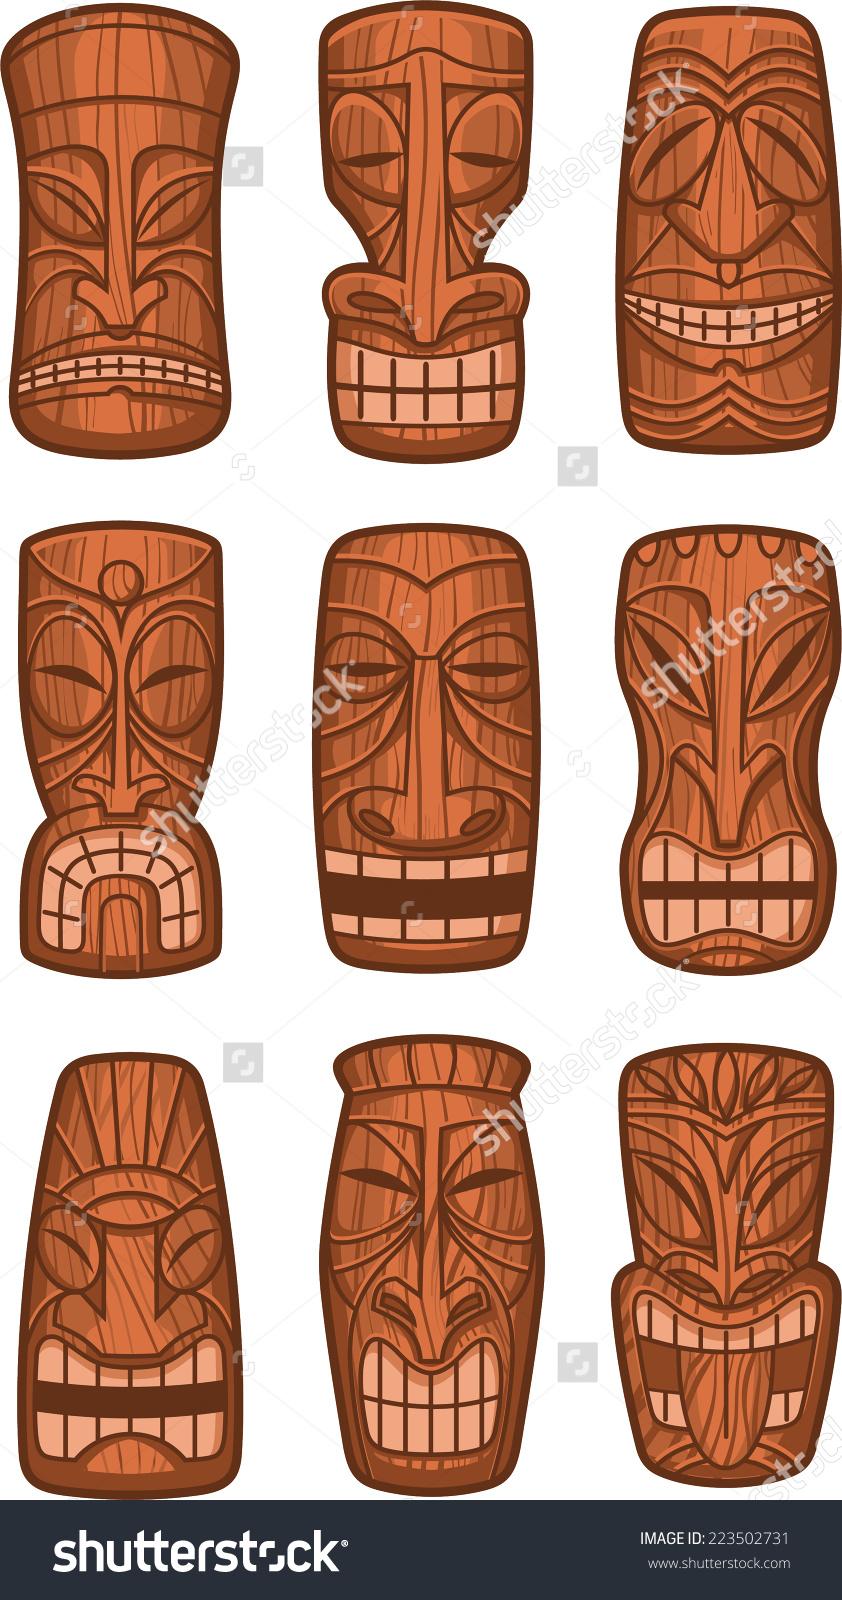 Hawaiian Tiki God Statue Carved Polynesian Stock Vector 223502731.